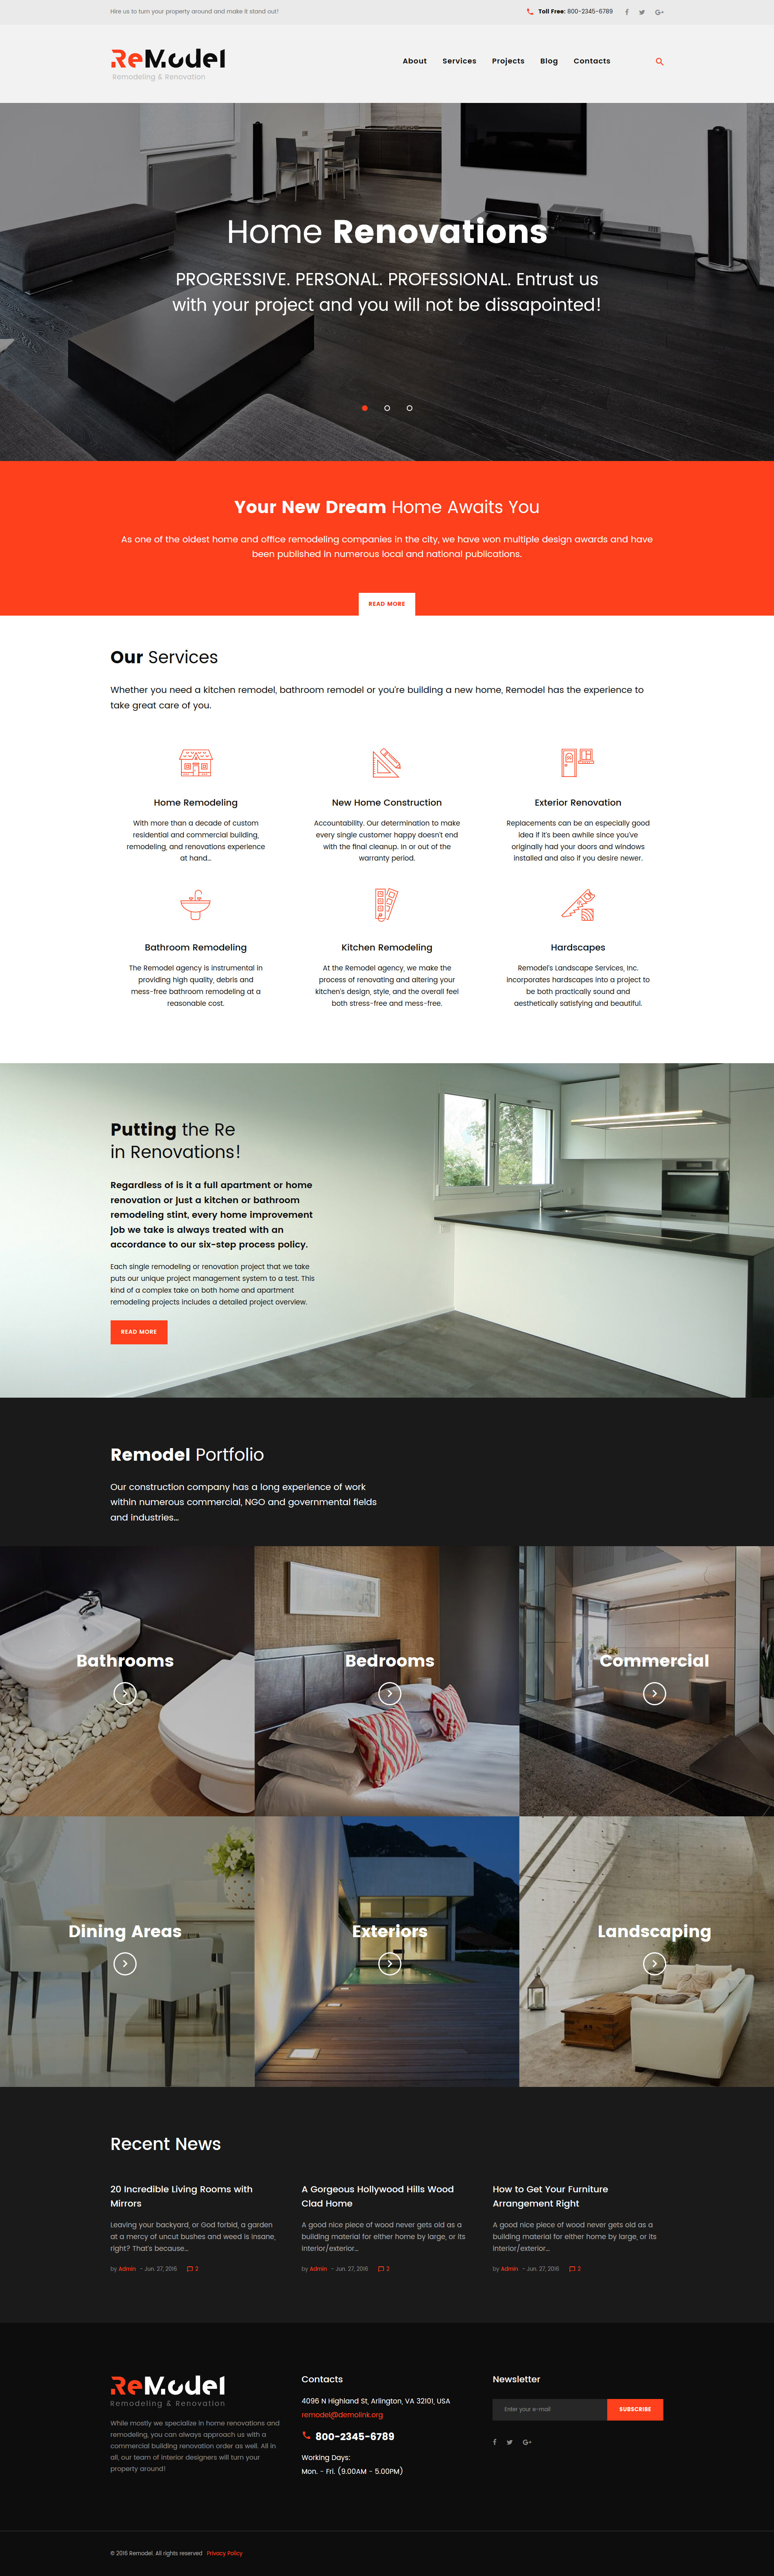 Шаблон Remodel сайта на тему дизайн интерьера #61171